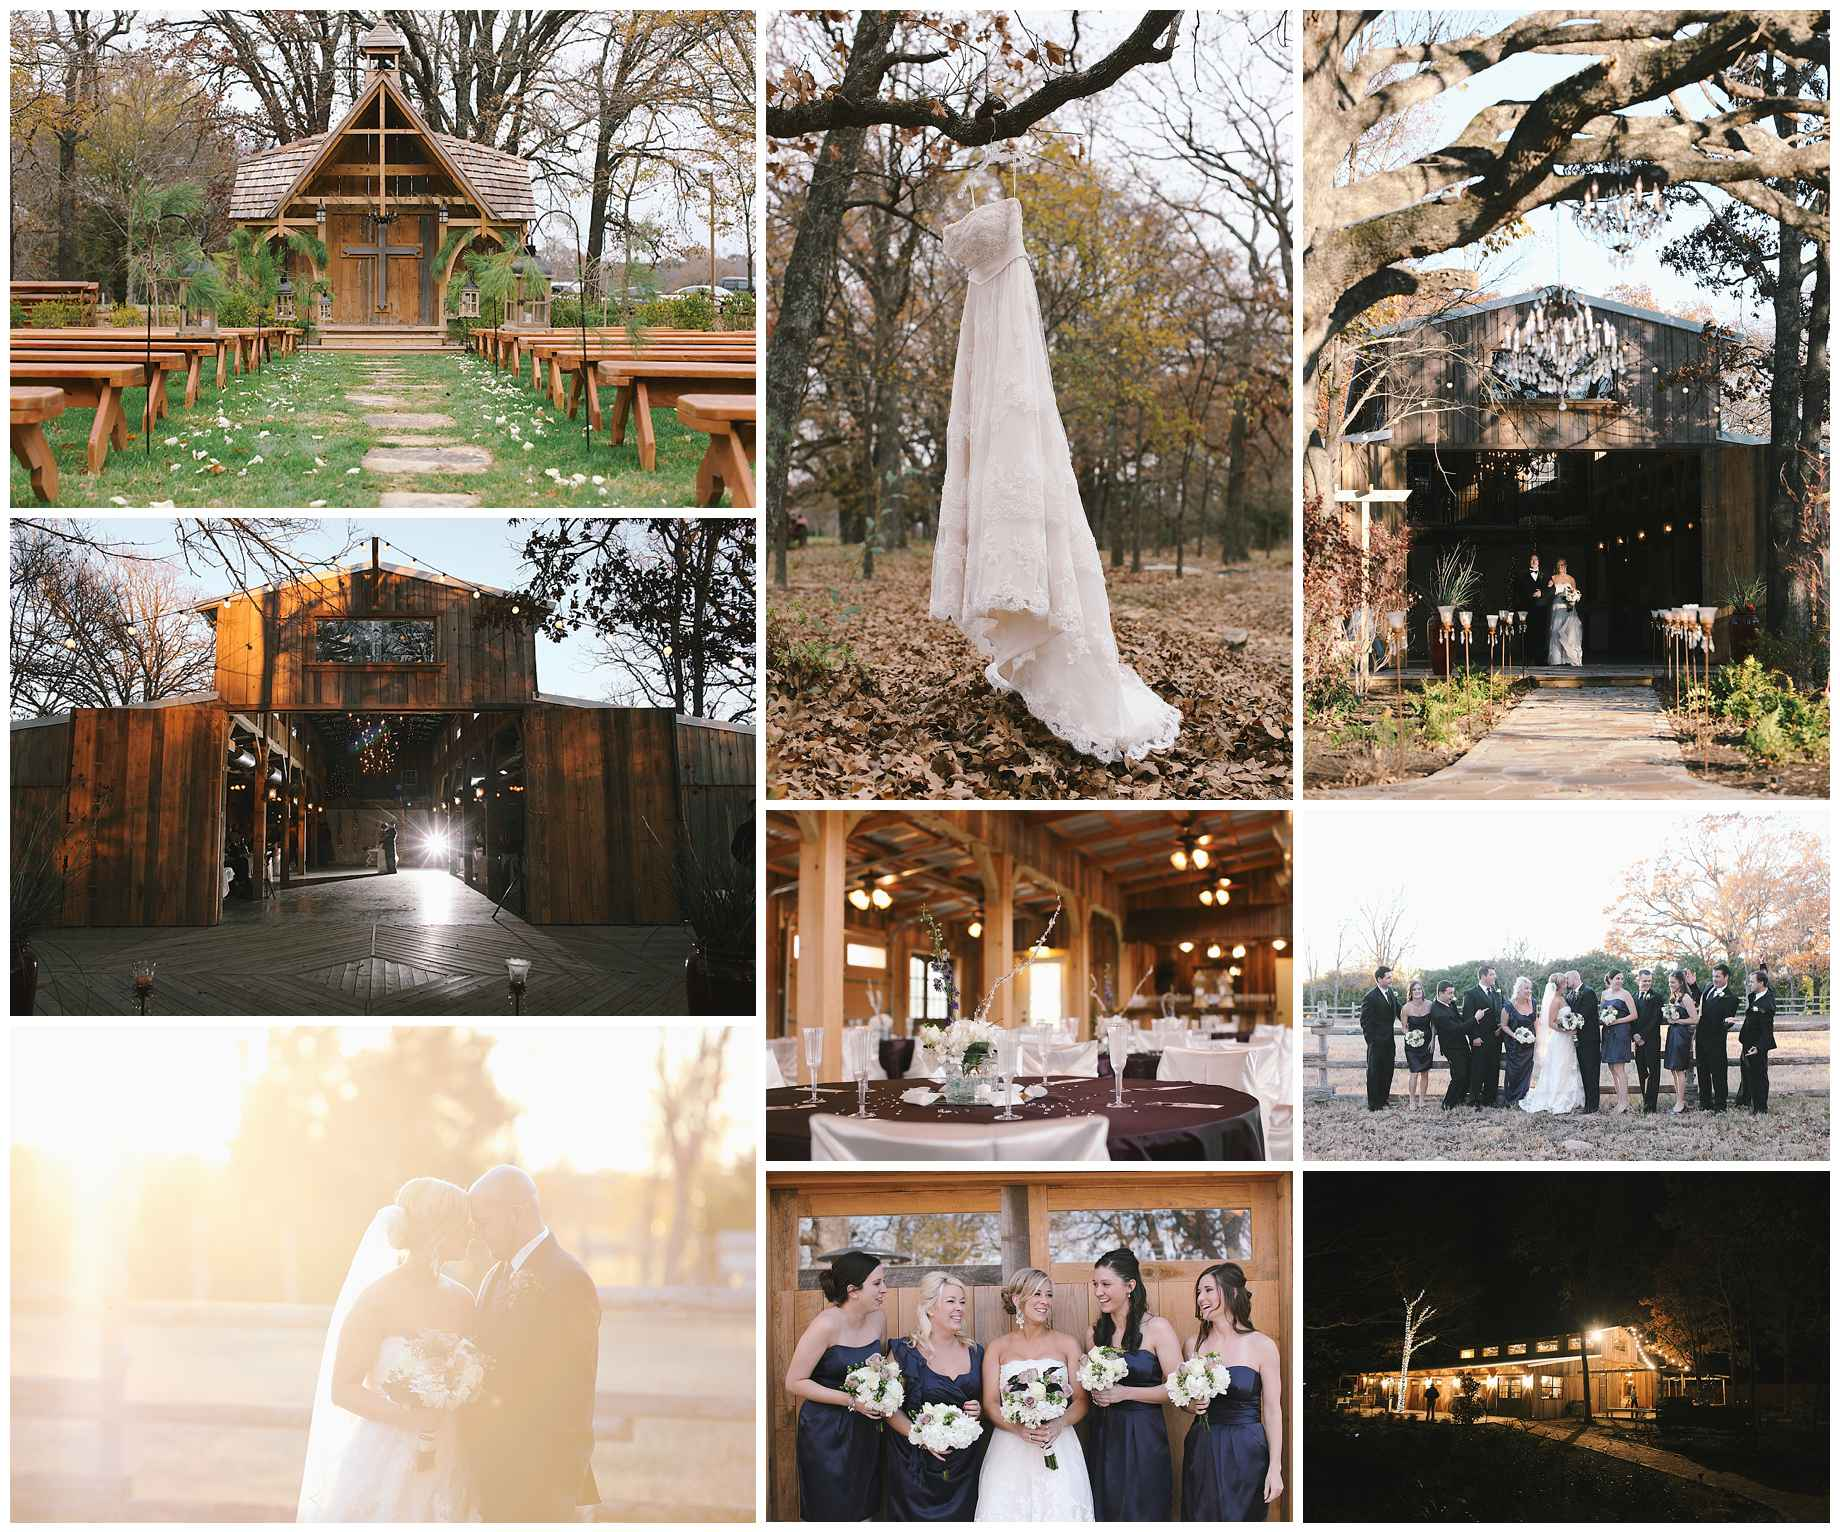 Top10easttexasweddingvenuesstoneoak: Small Wedding Venues In Texas At Websimilar.org